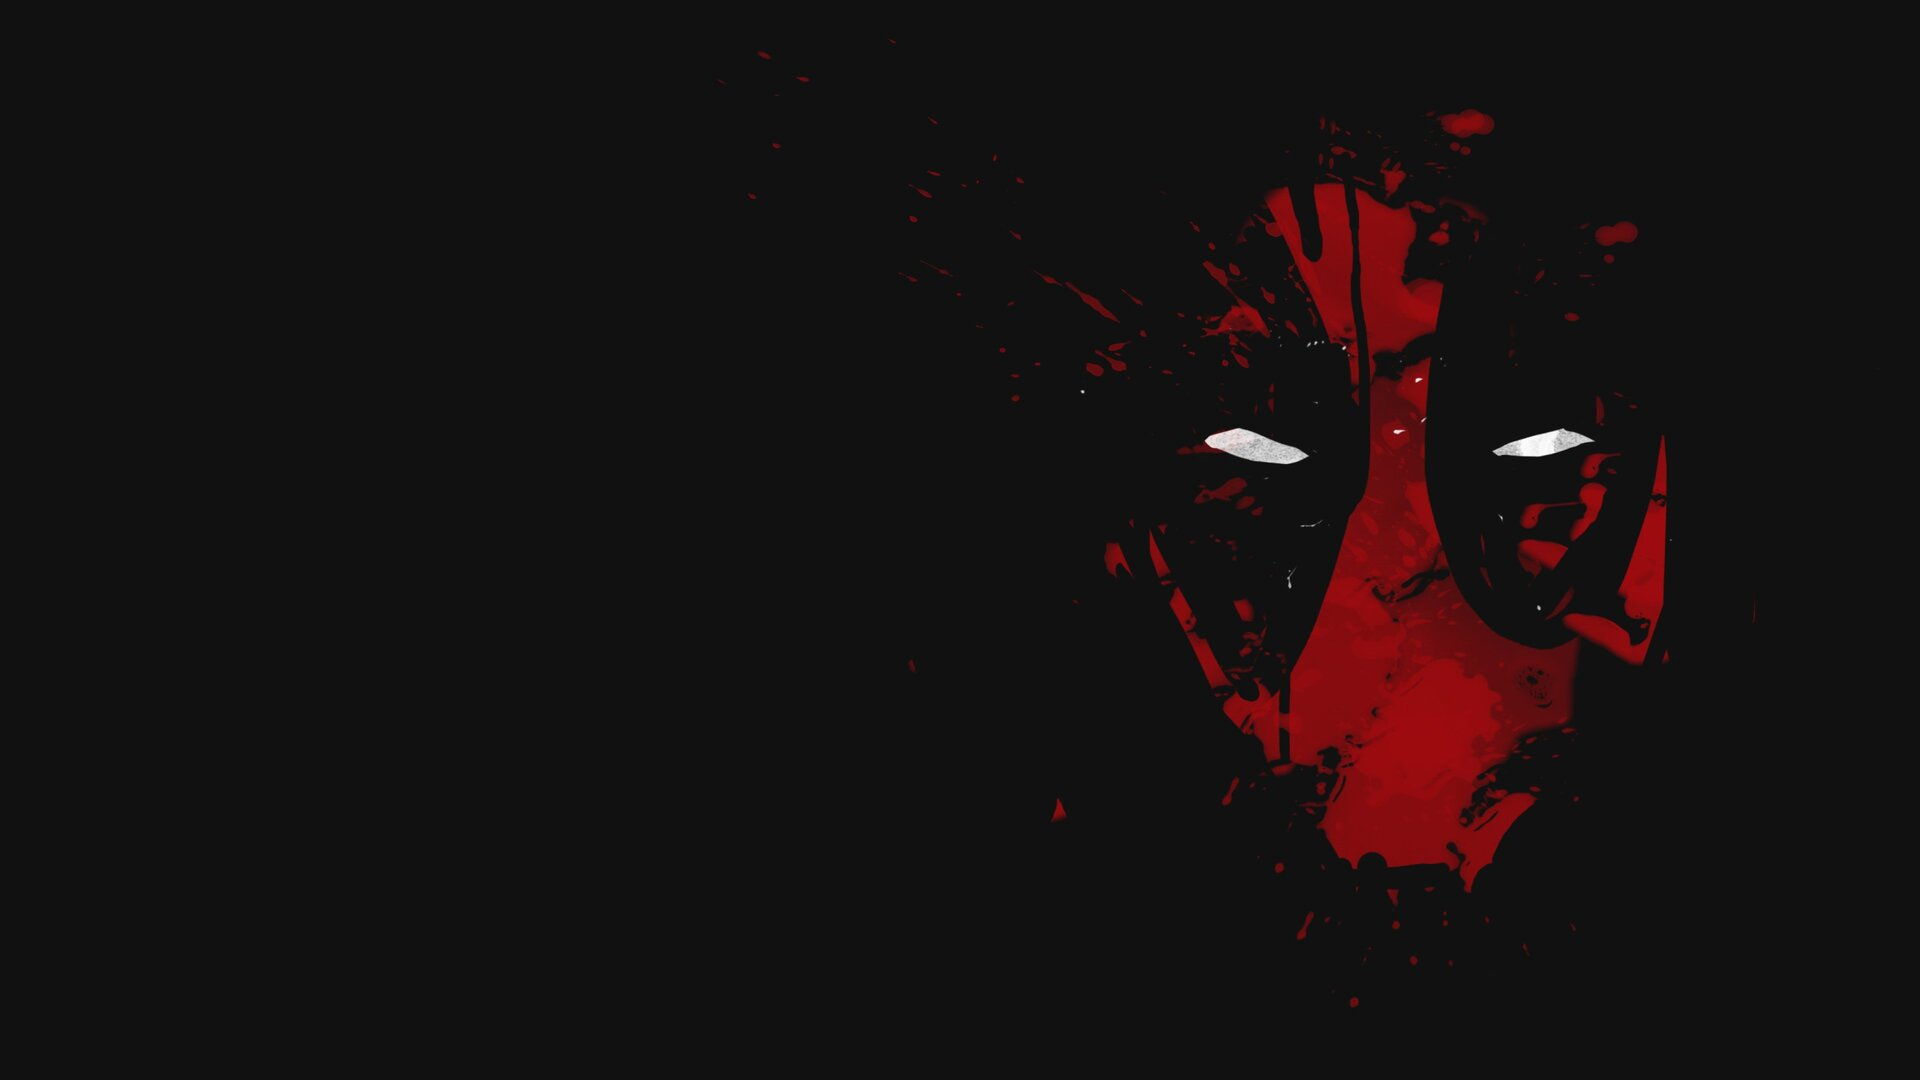 1920x1080 Deadpool Abstract 4k Laptop Full HD 1080P HD 4k ...